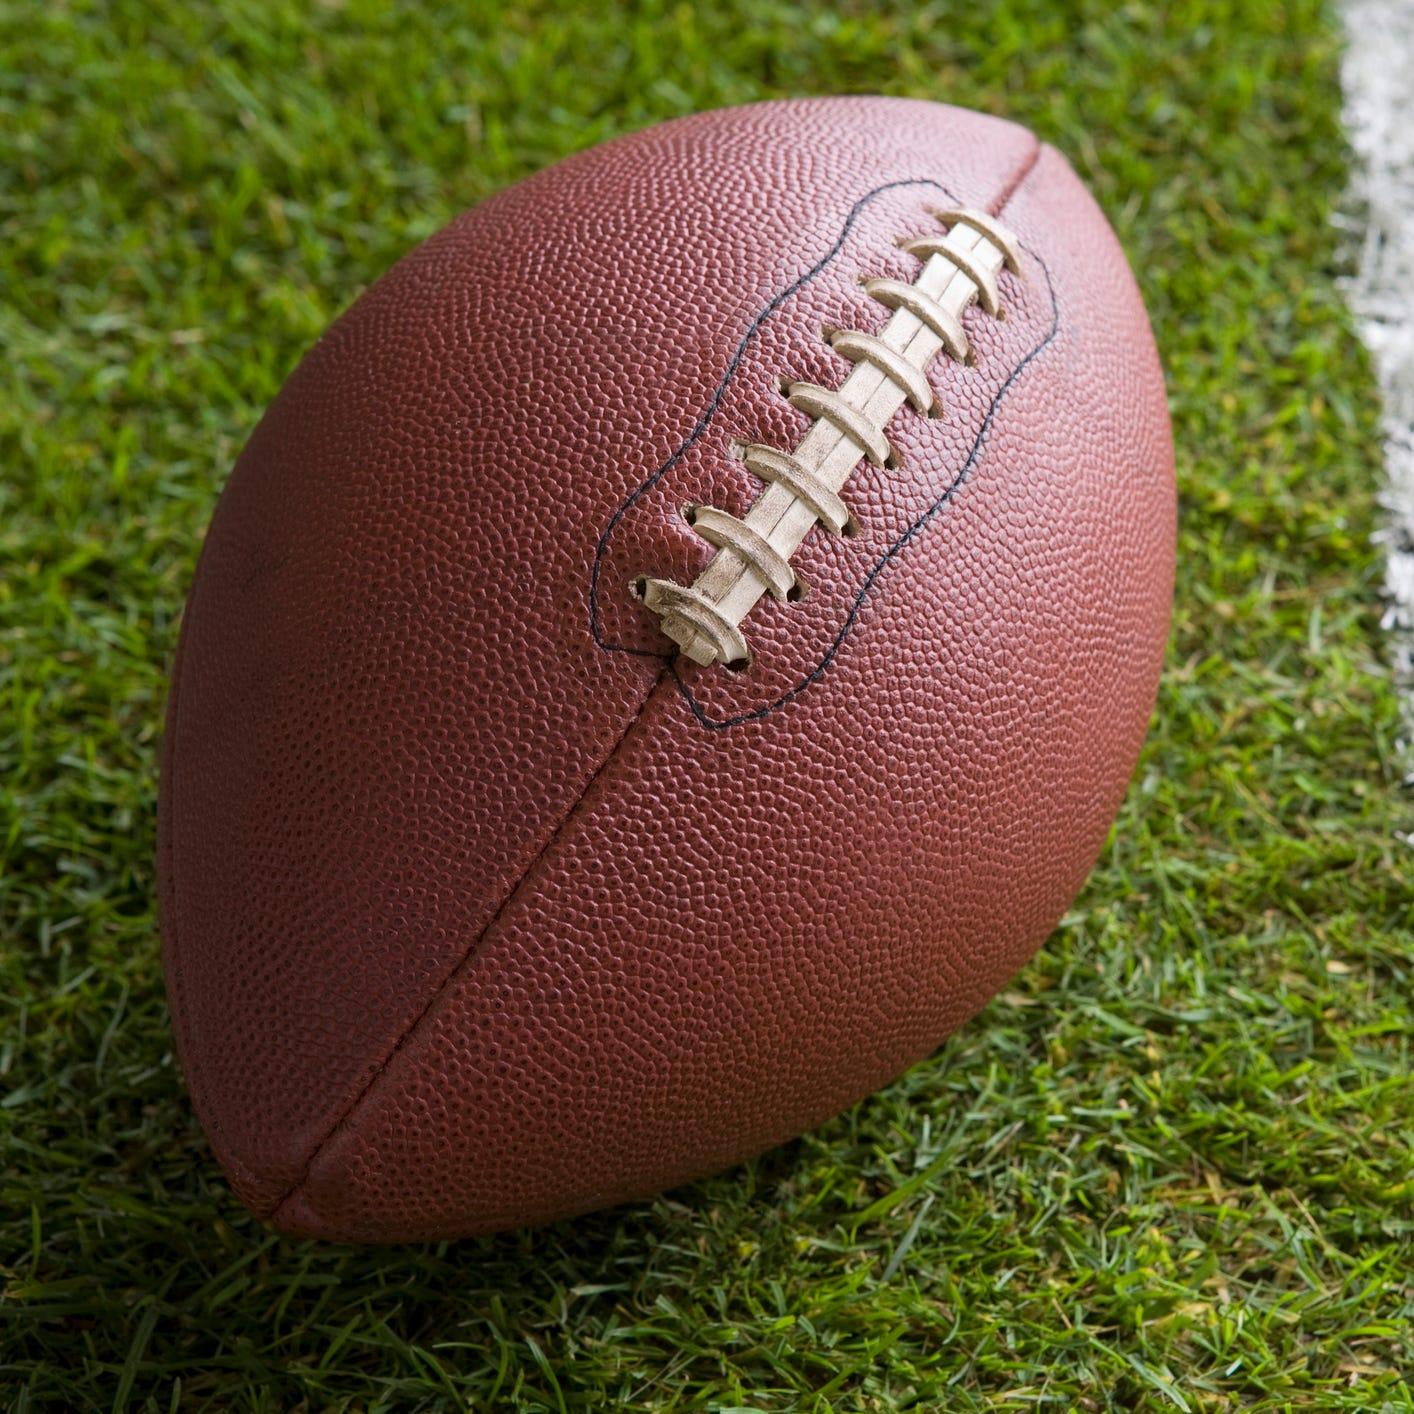 UW-Oshkosh offense struggles in football loss to Davenport University